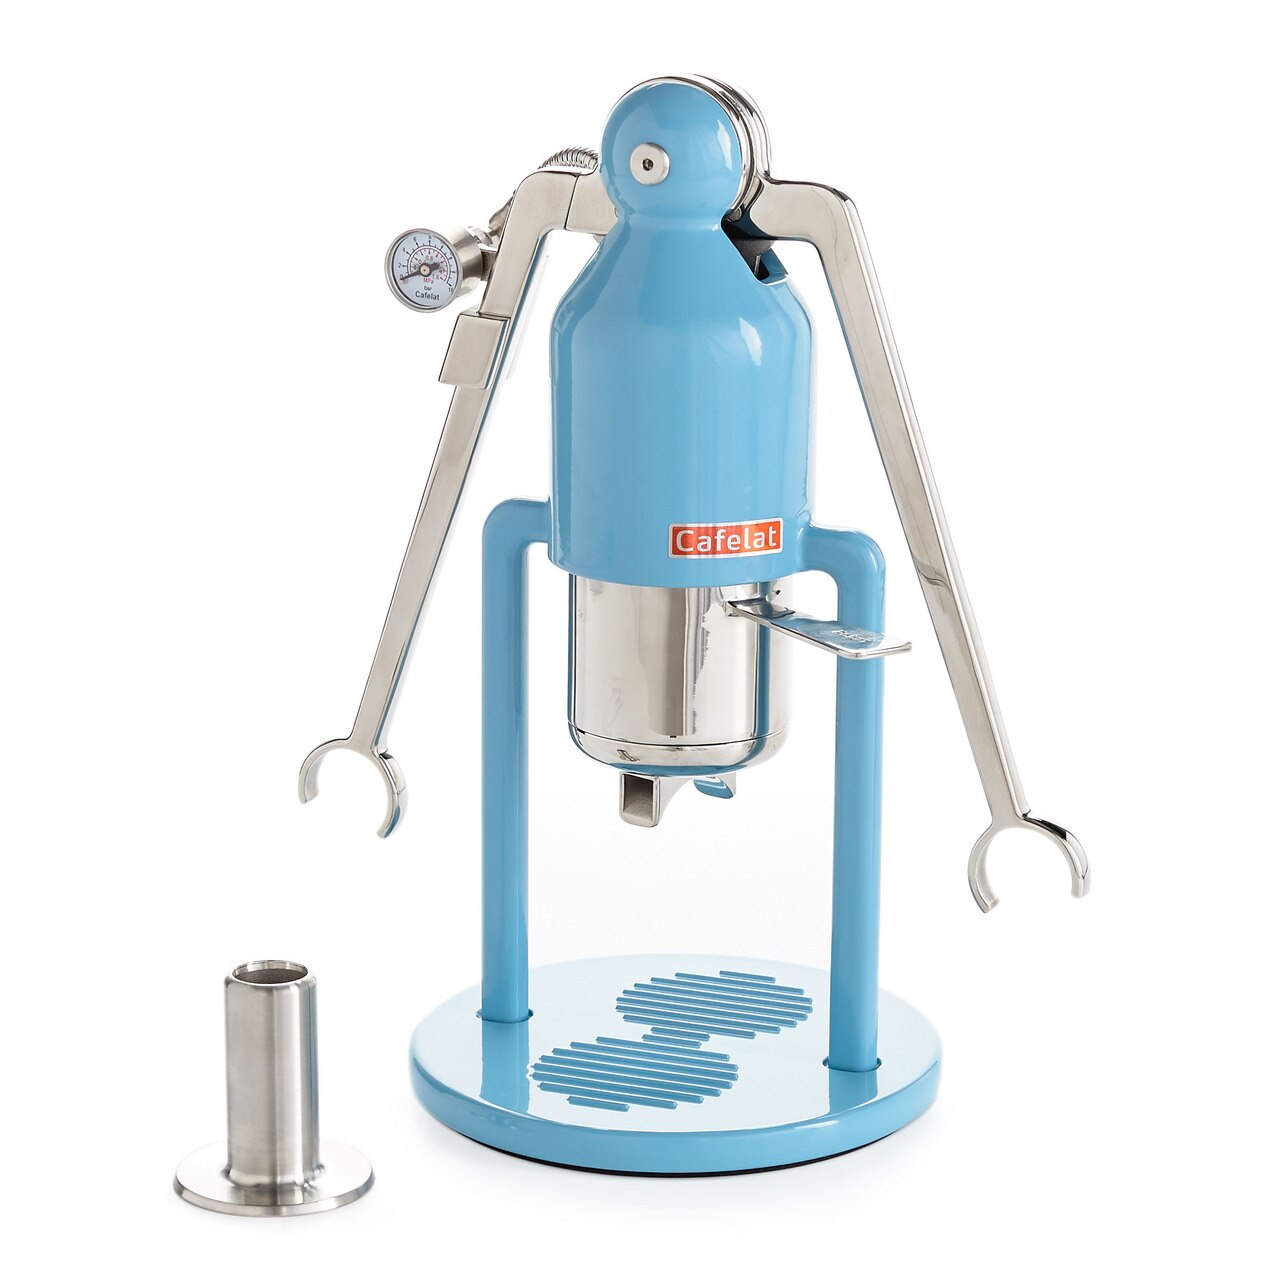 Cafelat Robot Manual Espresso Maker - Barista Version Retro Blue - #308